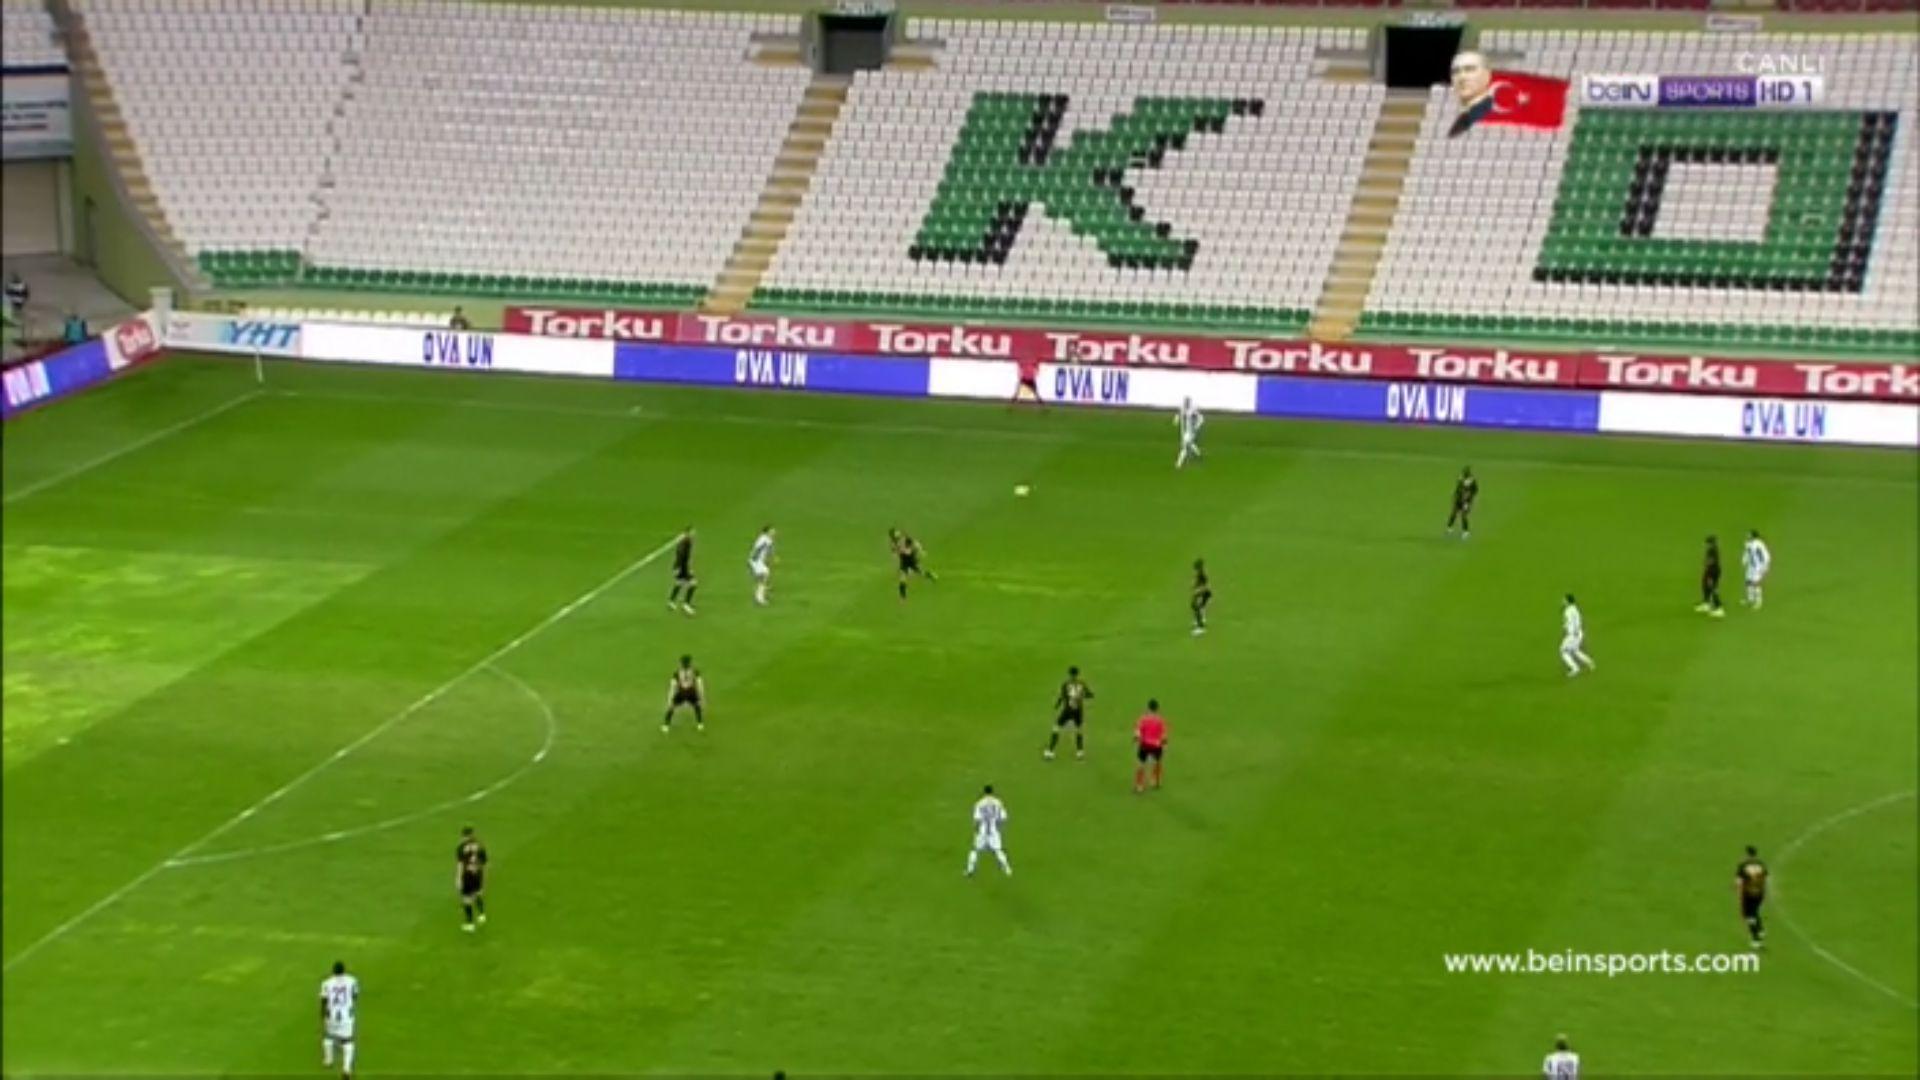 29-10-2017 - Konyaspor 1-0 Osmanlispor FK